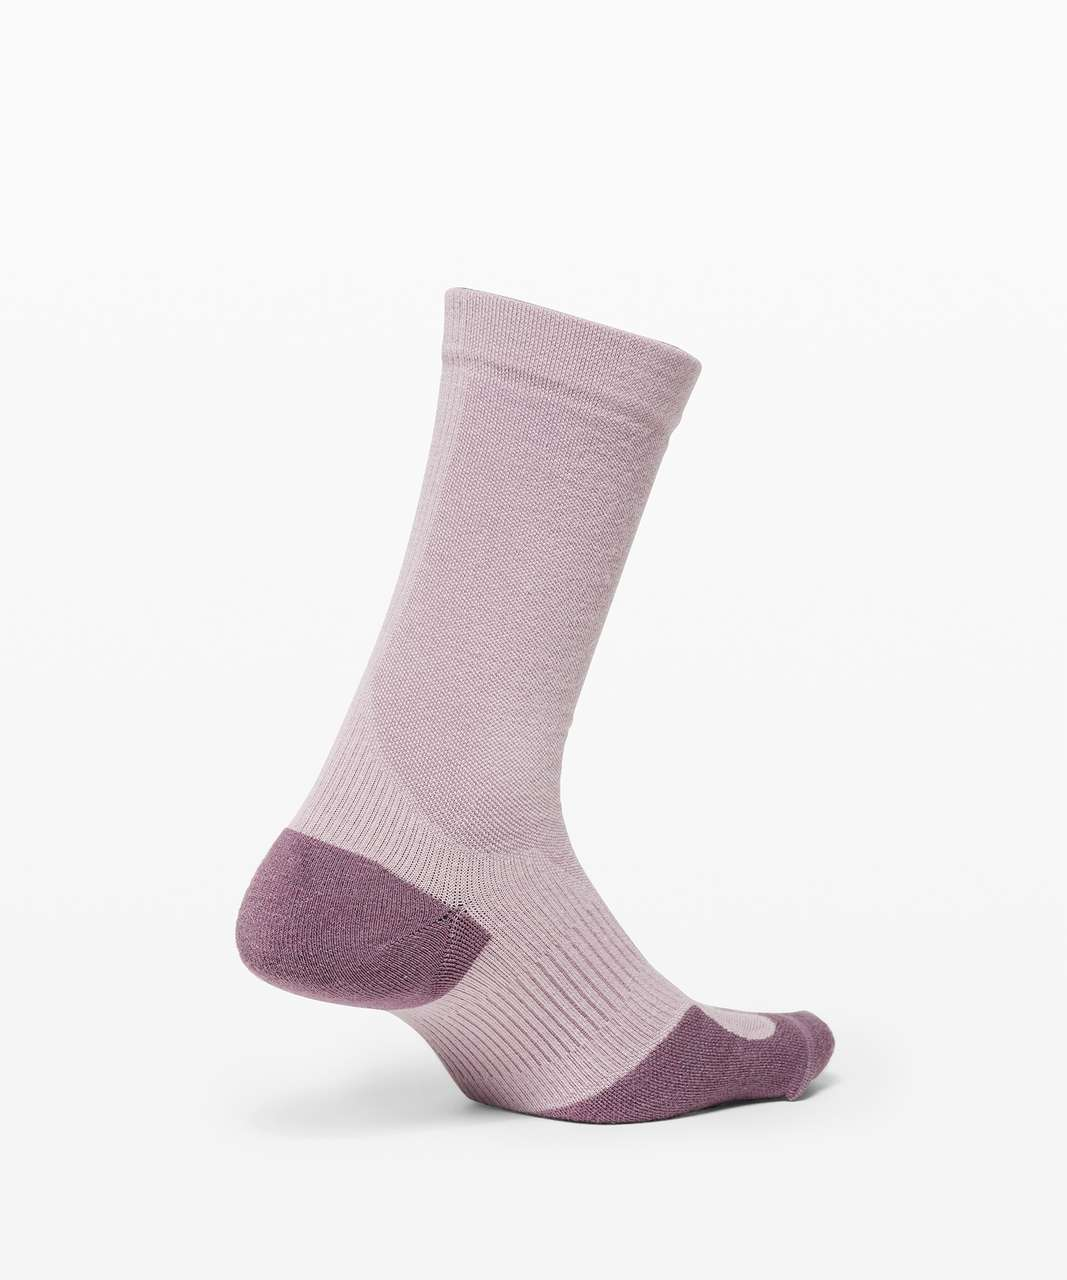 Lululemon Coast to Roam Crew Sock *Wool - Frosted Mulberry / Smoky Blush